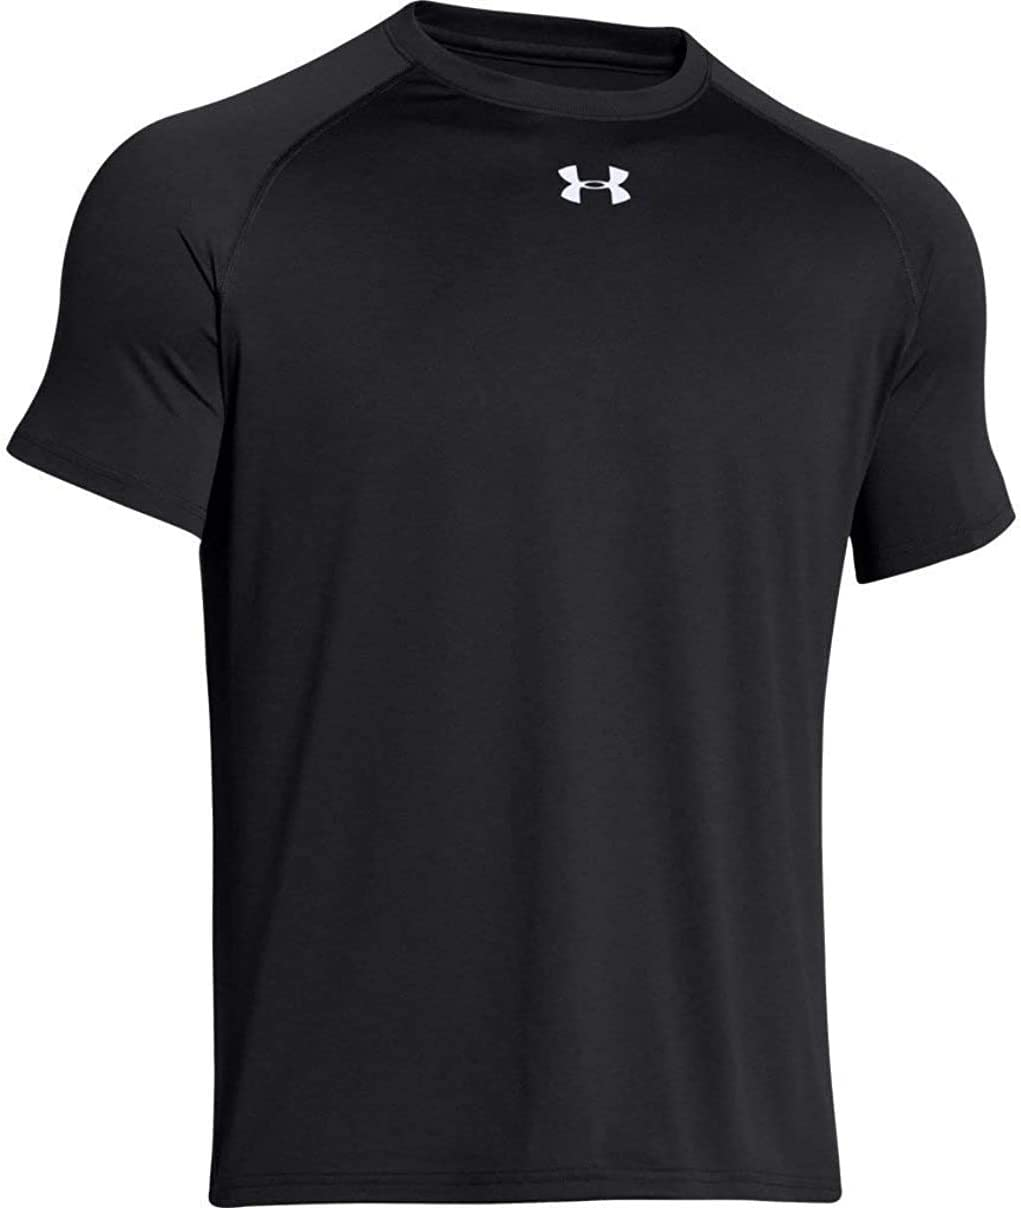 Under Armour Boys' Athletic Shirts